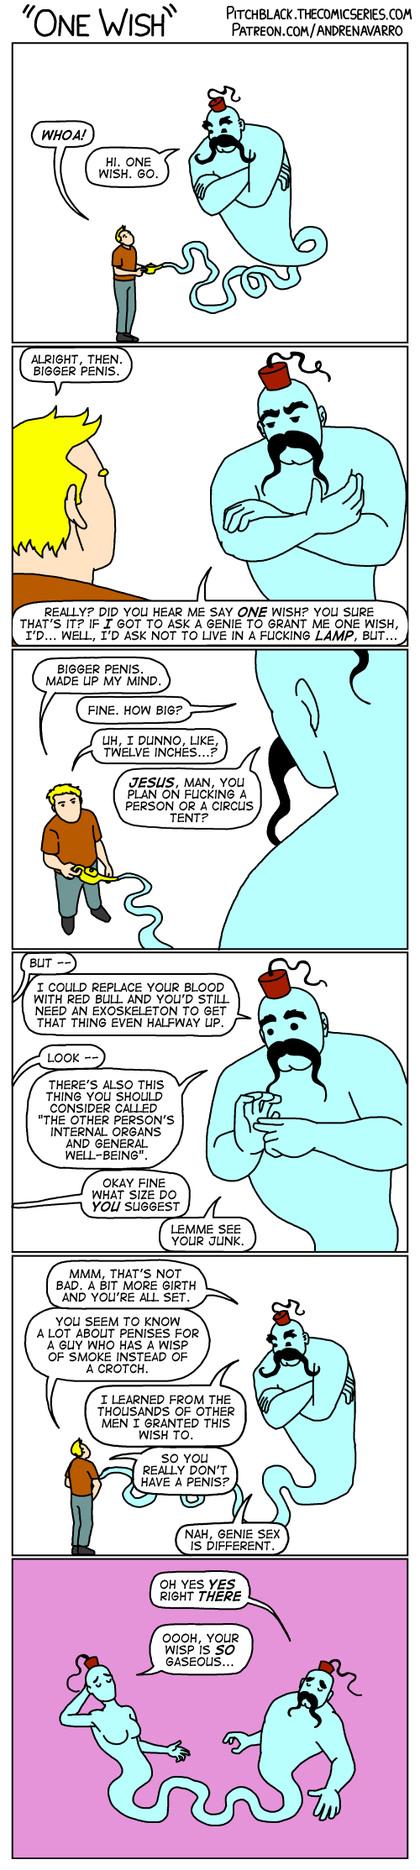 The genie sex